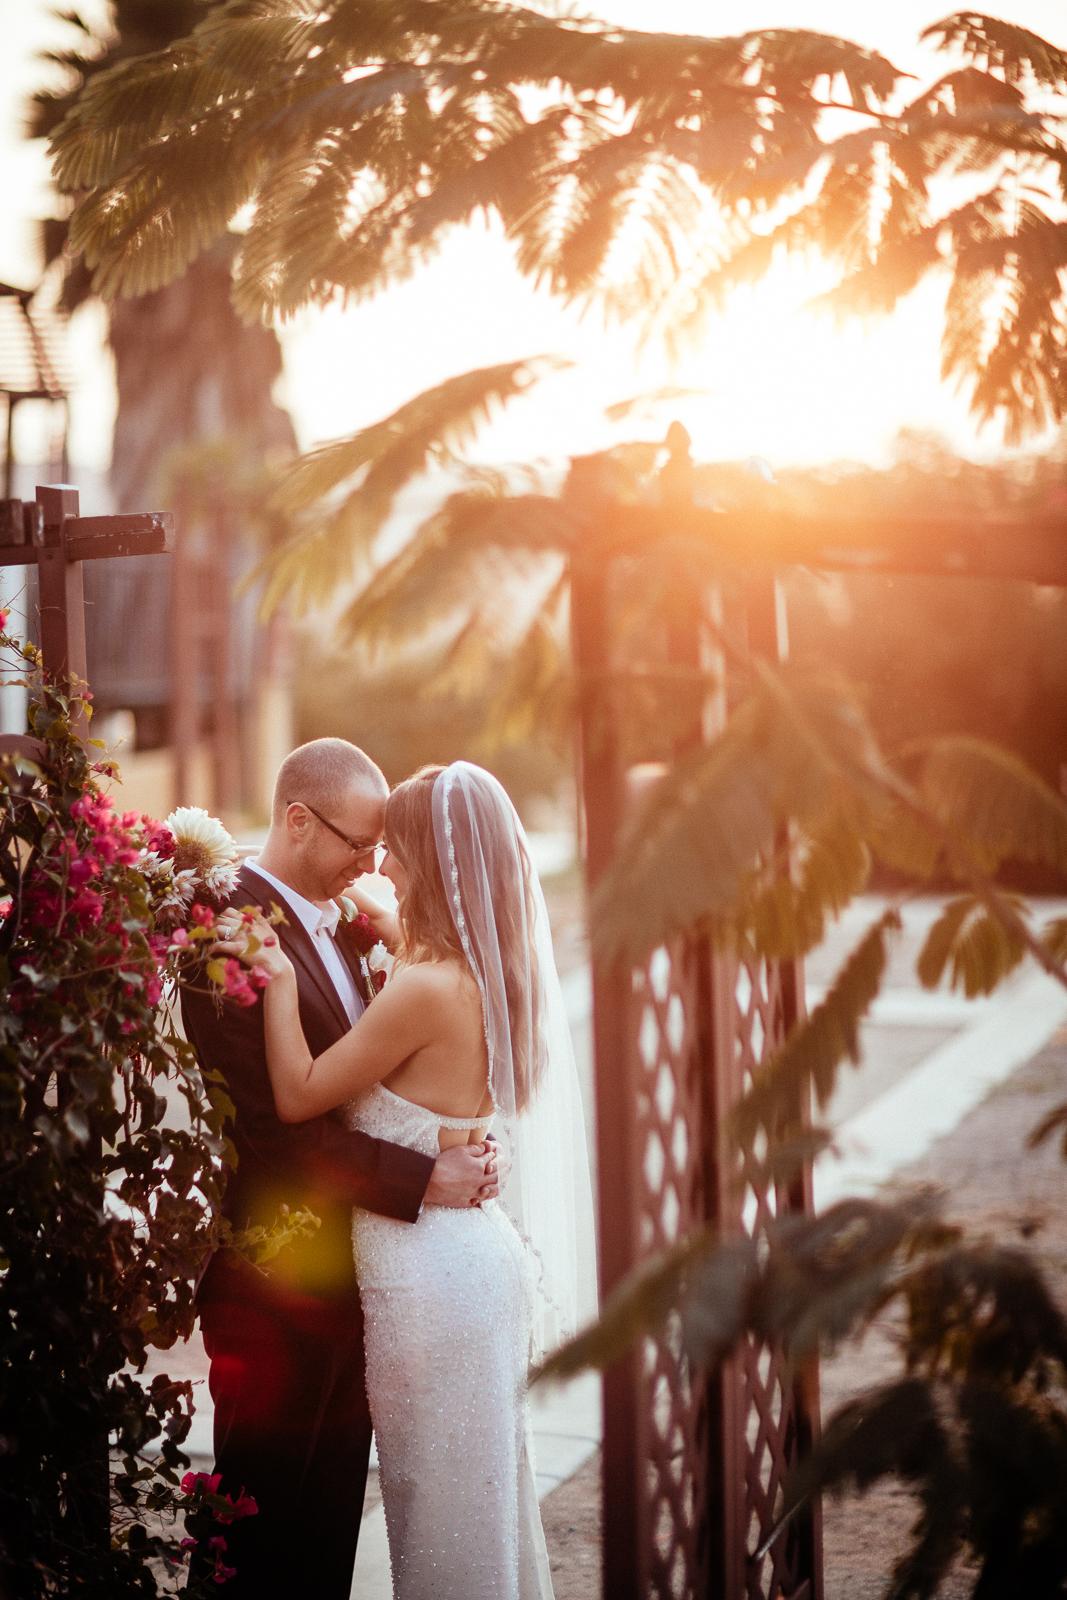 TORI_&_ALEX_WEDDING_2015_IMG_8534.JPG